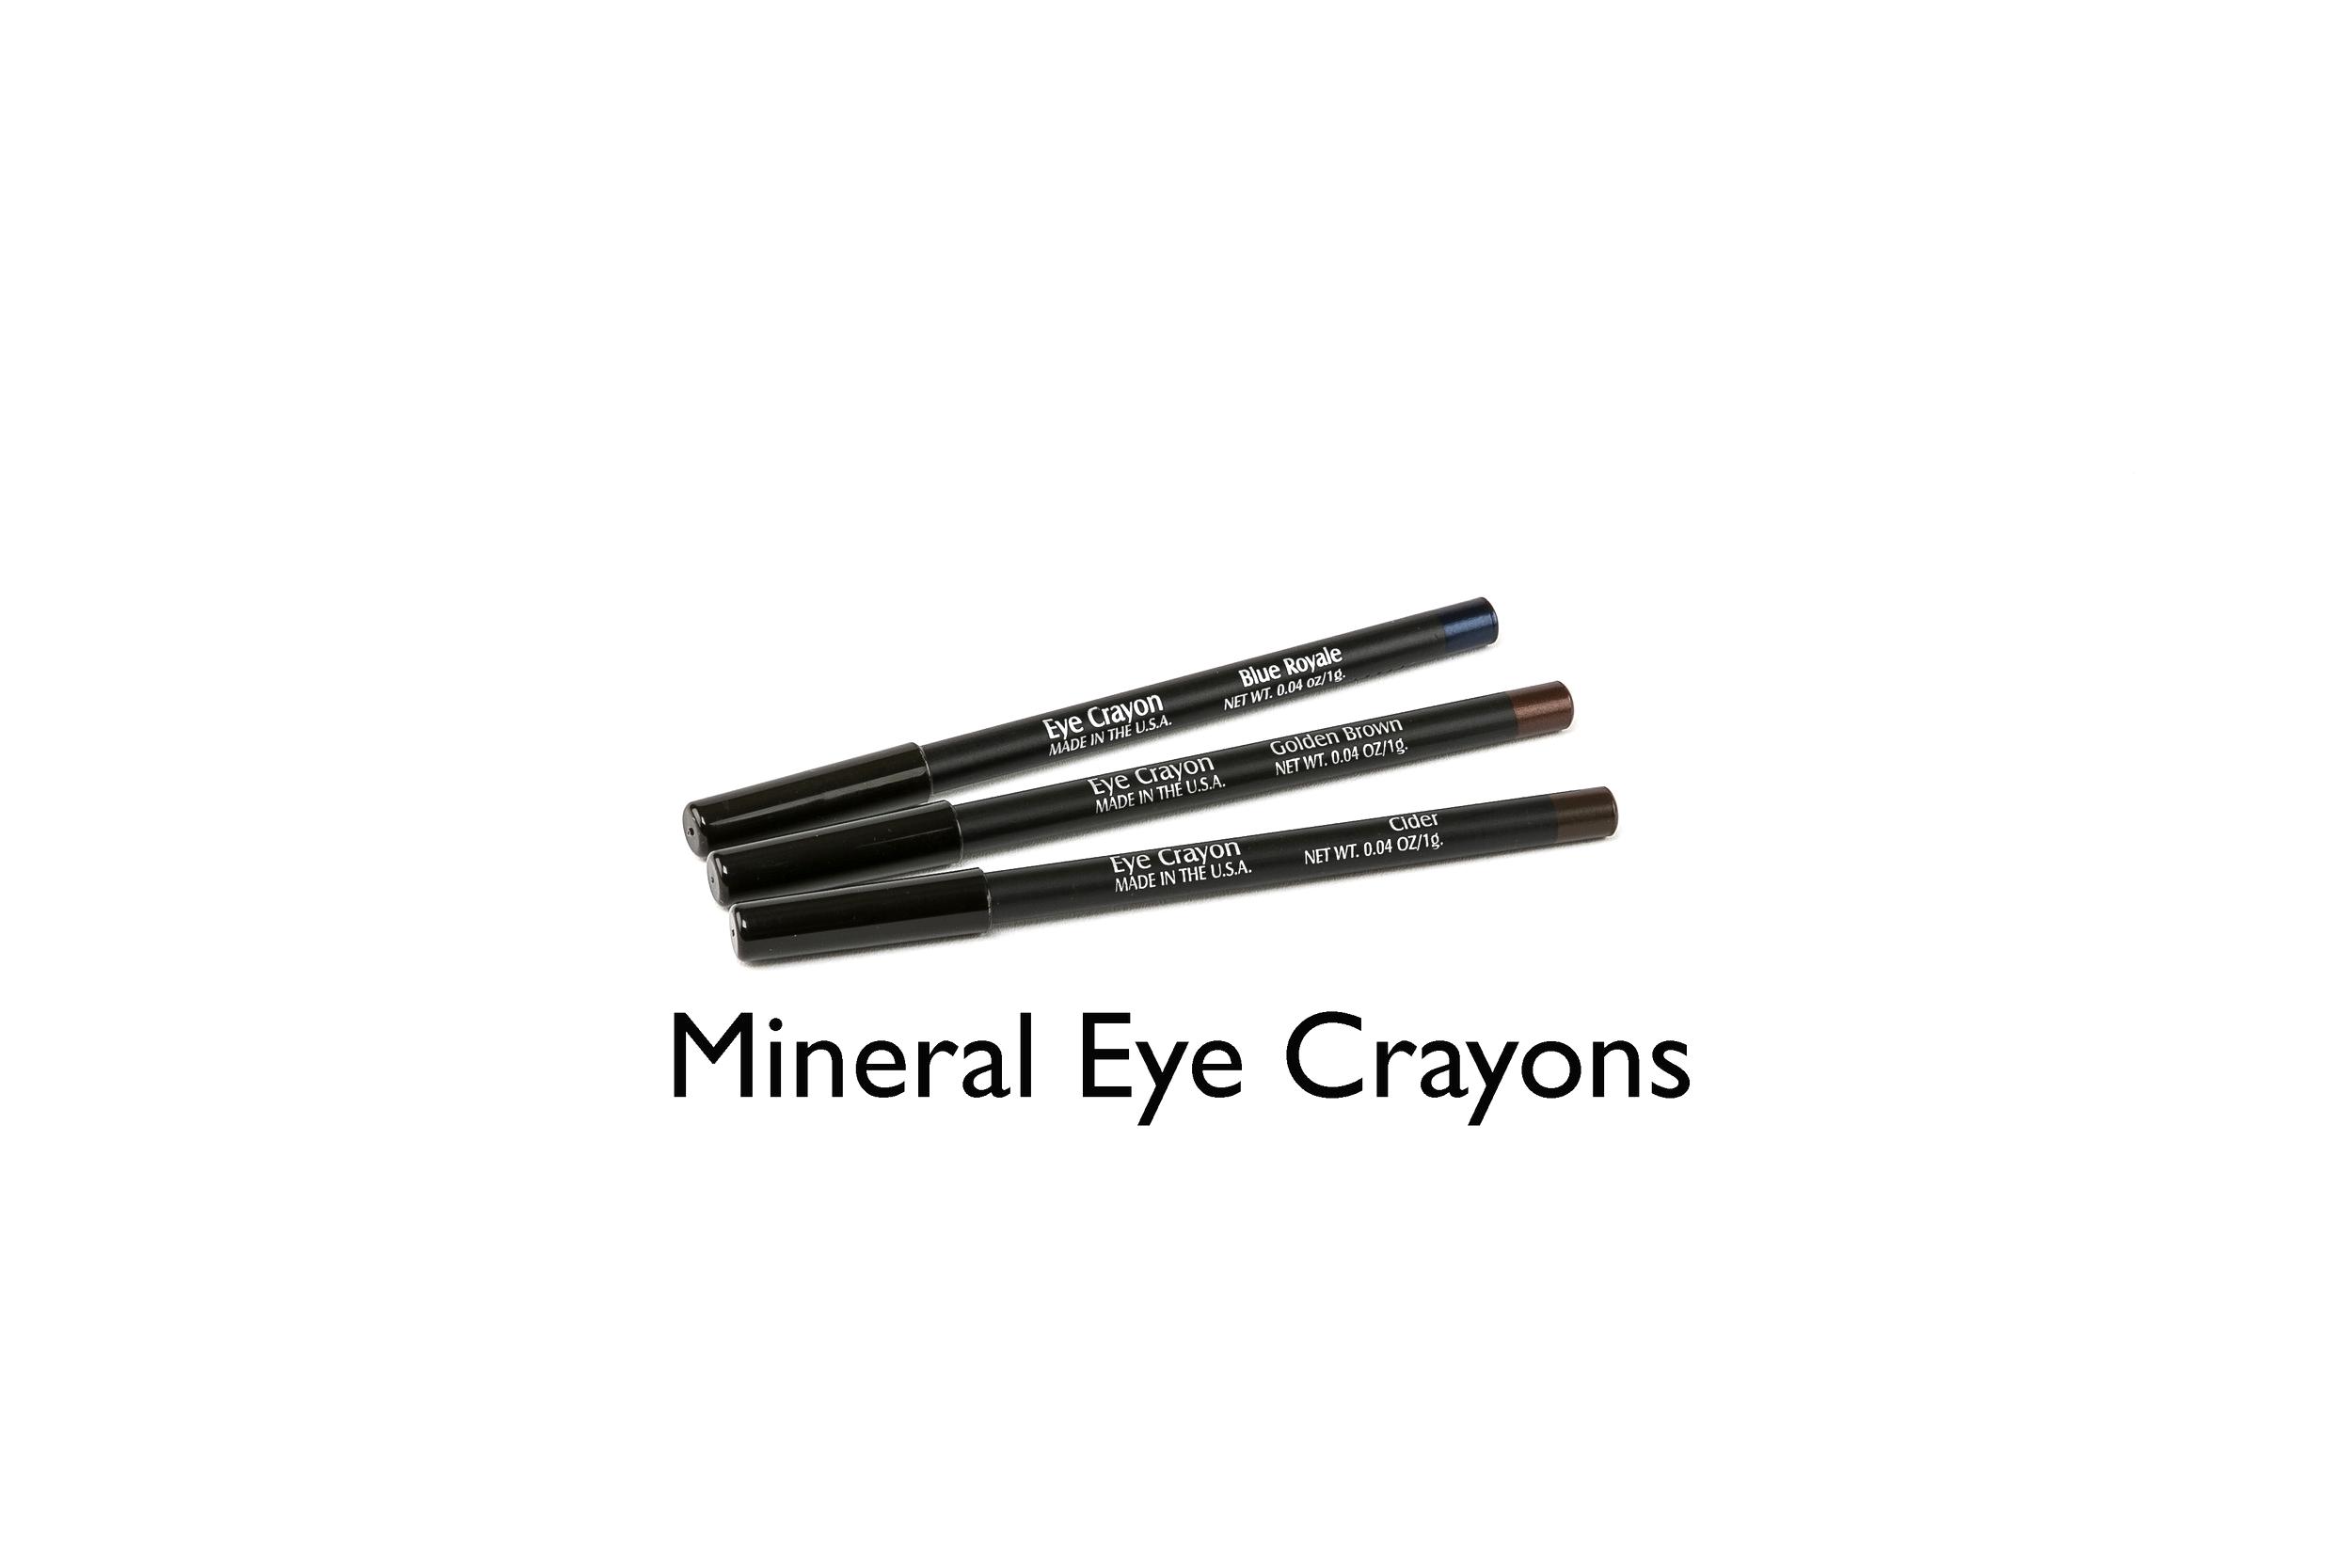 Mineral Eye Crayons